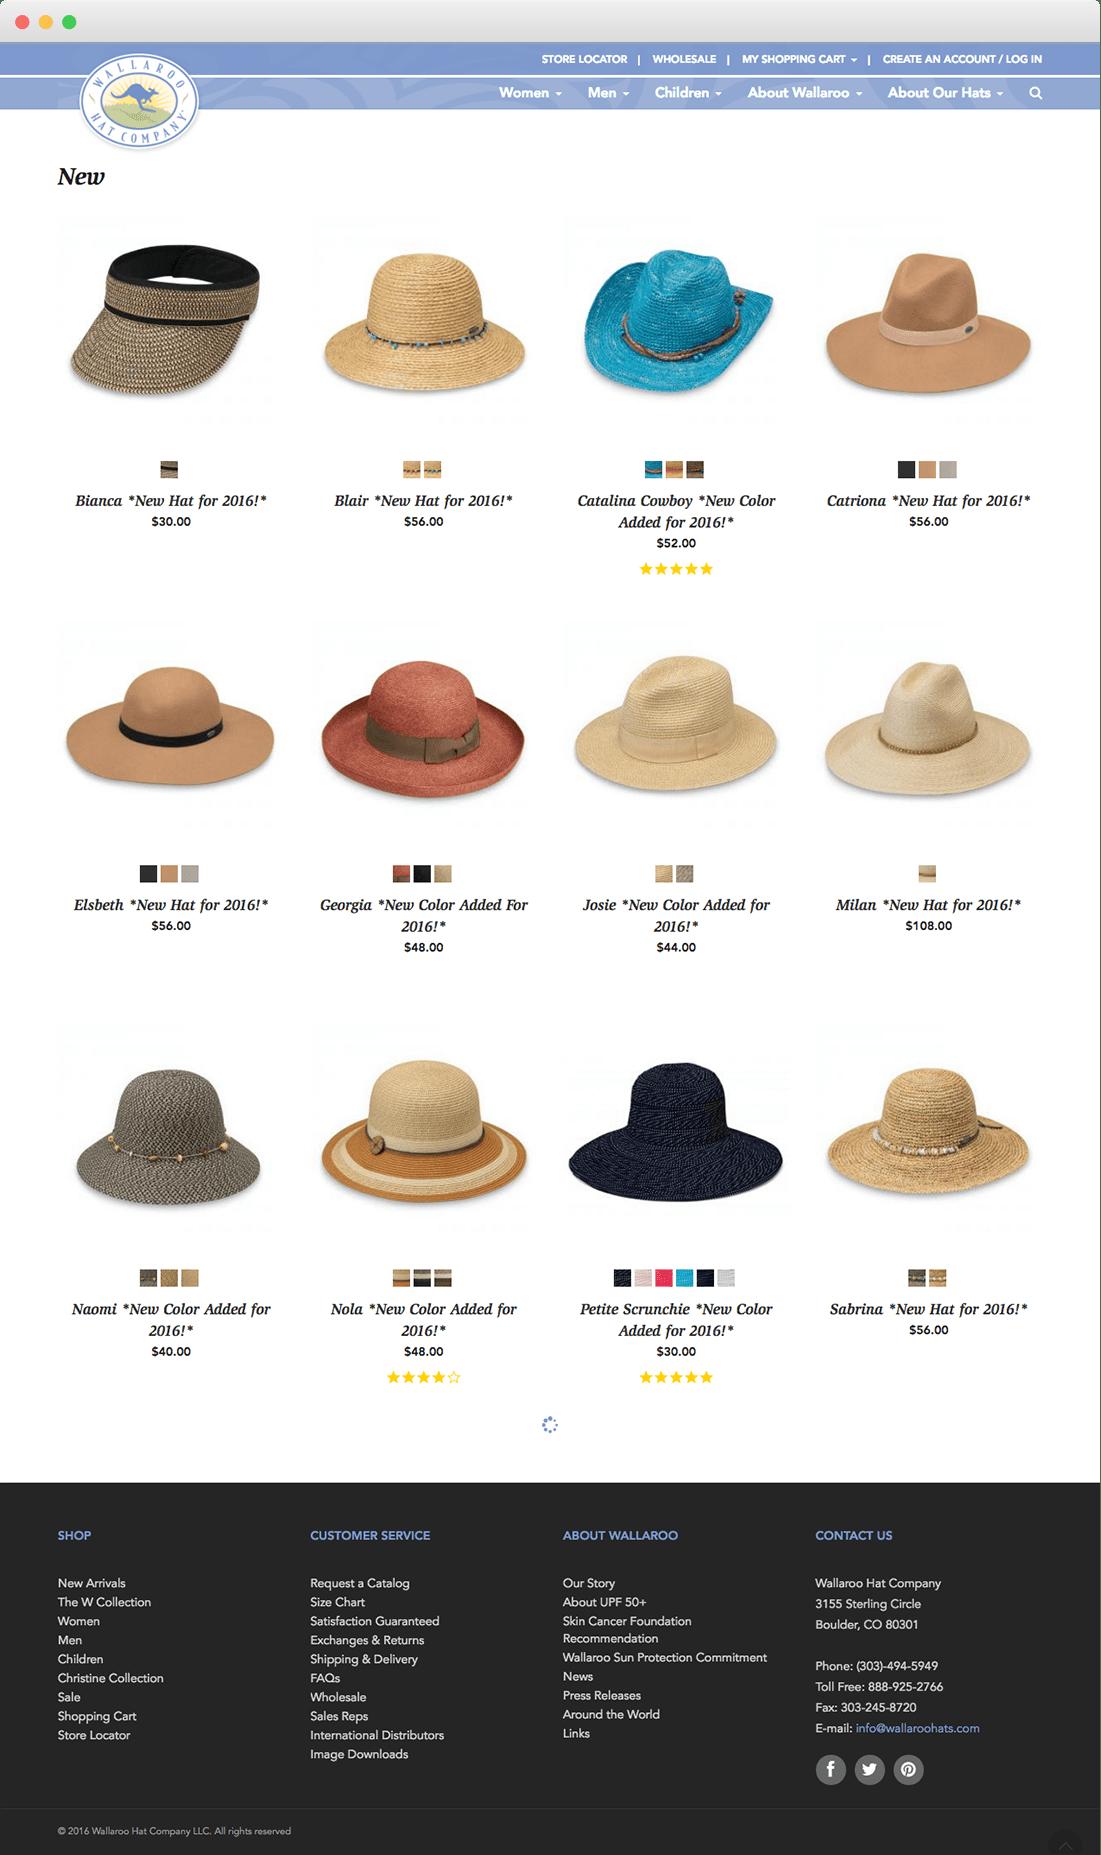 wallaroo product categories